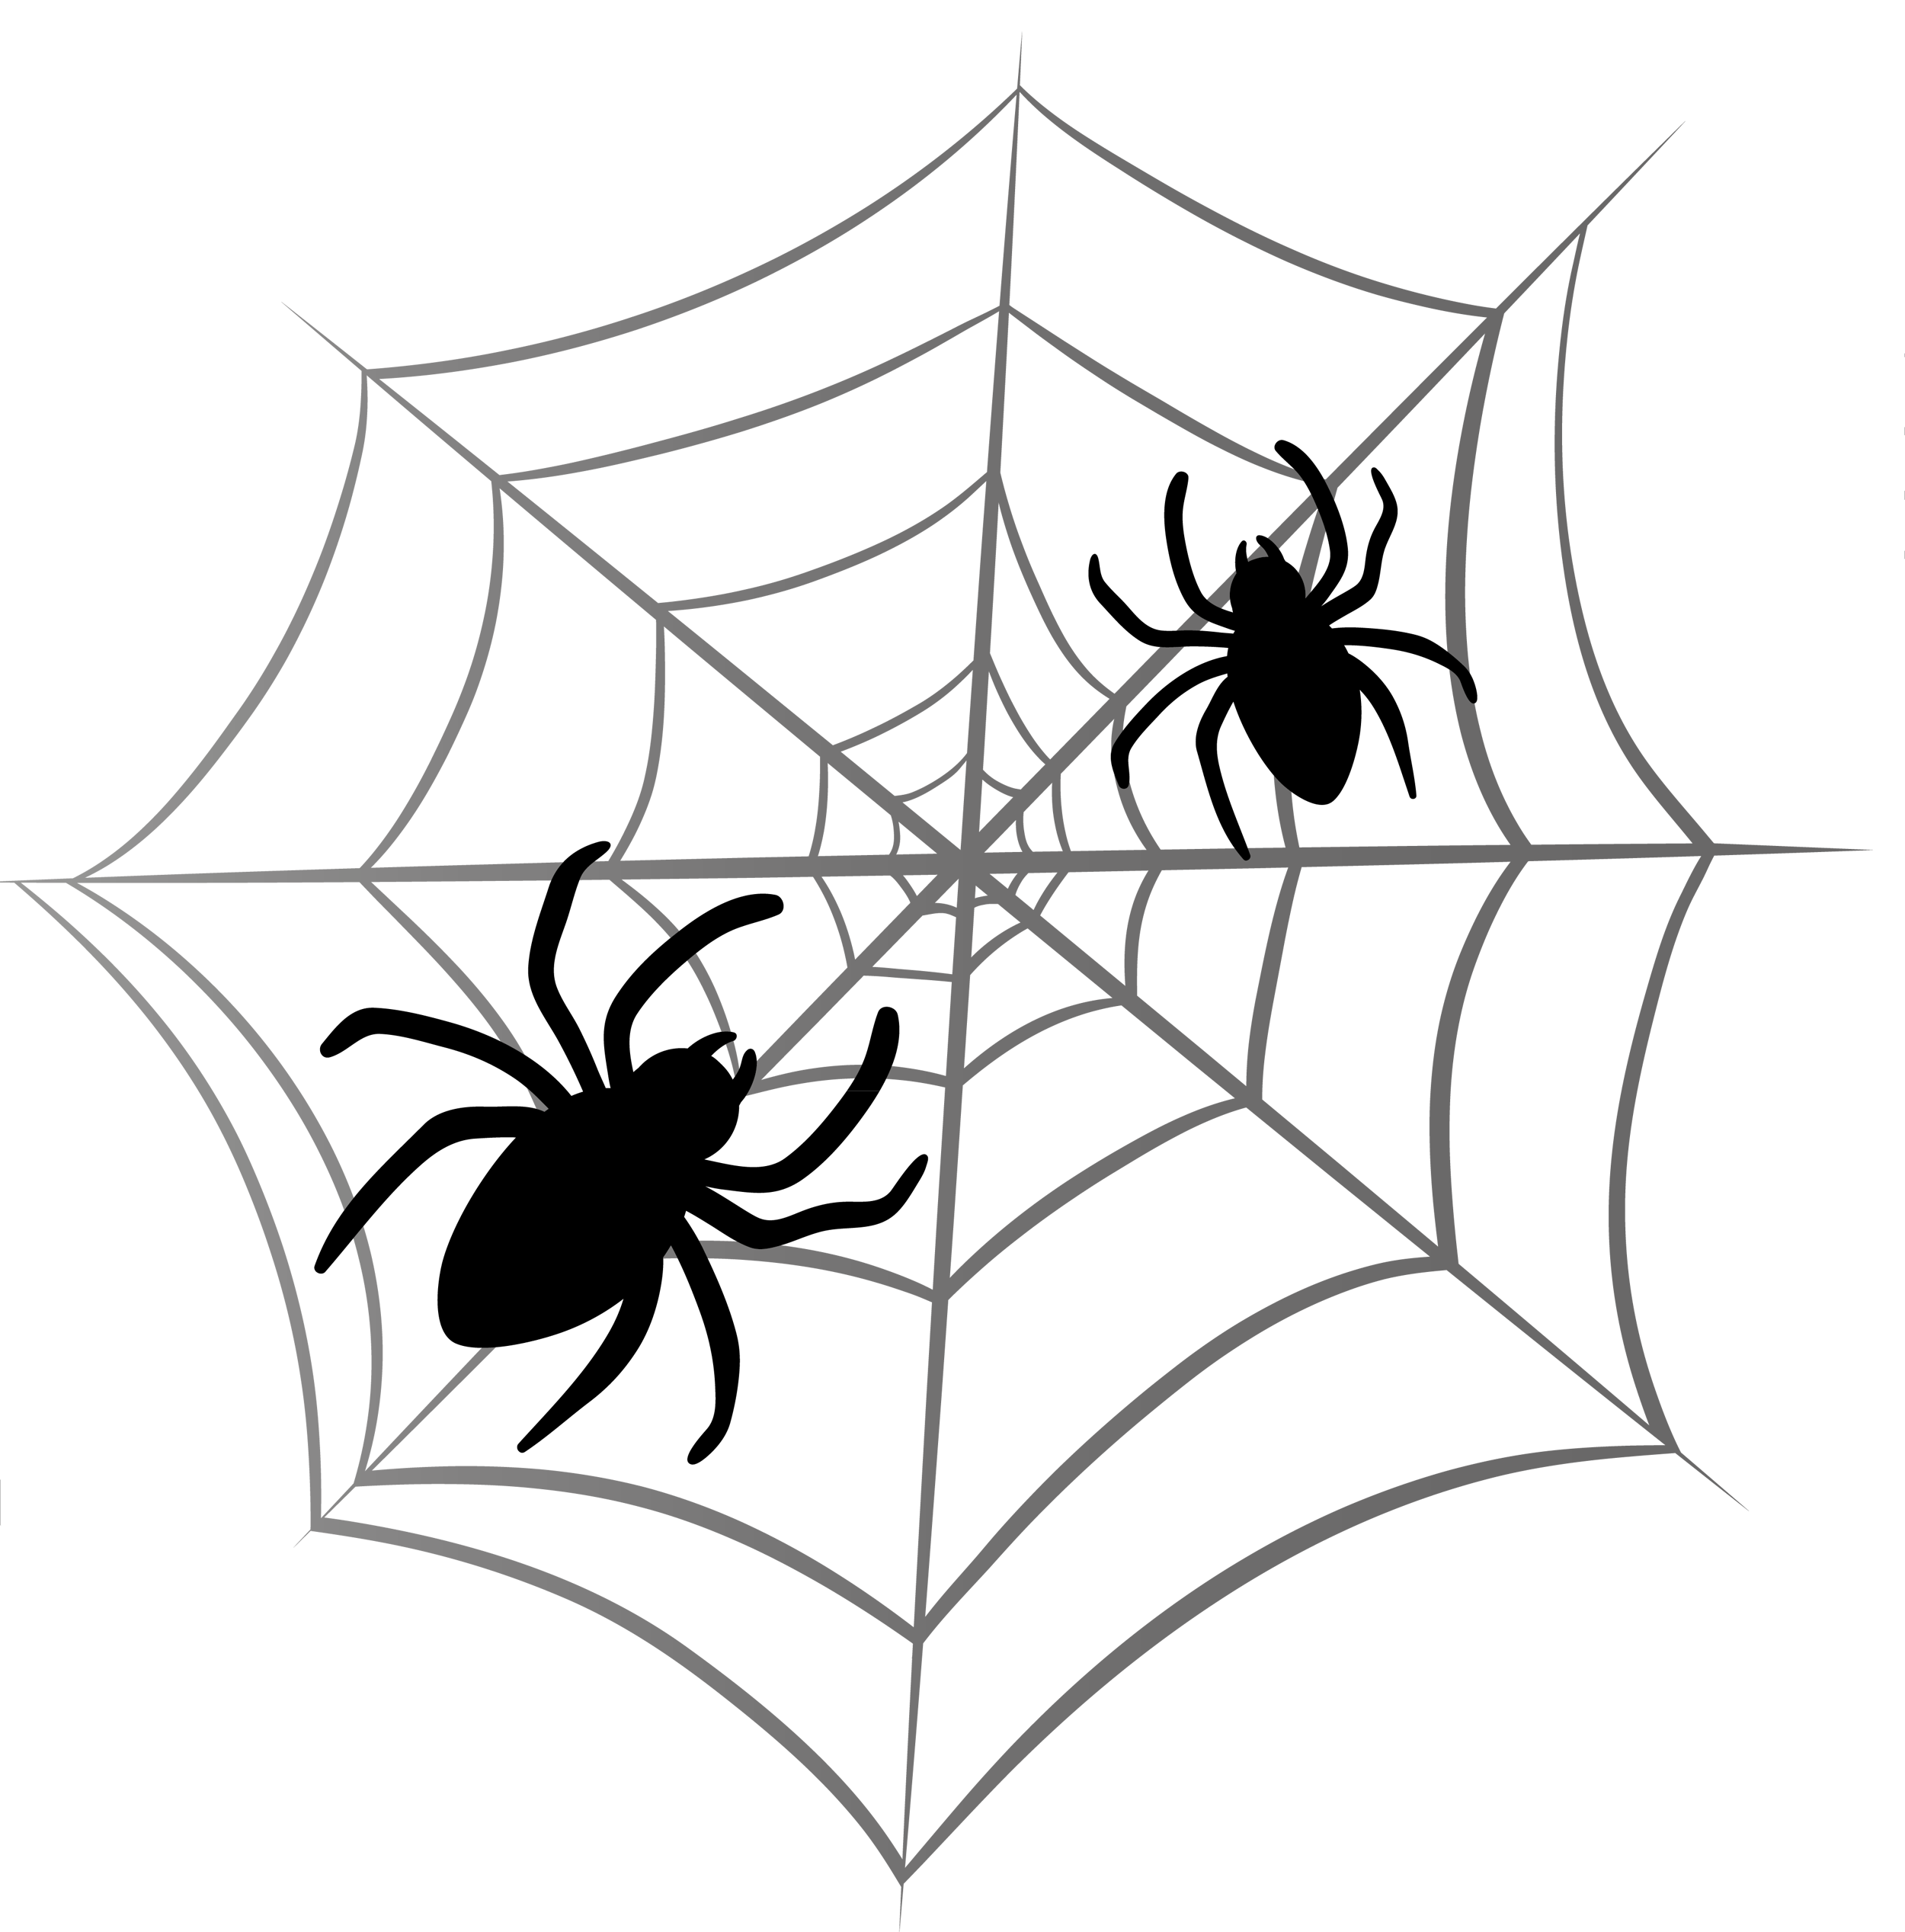 2500x2535 Spider Web Spiders Clip Art Clipart 4